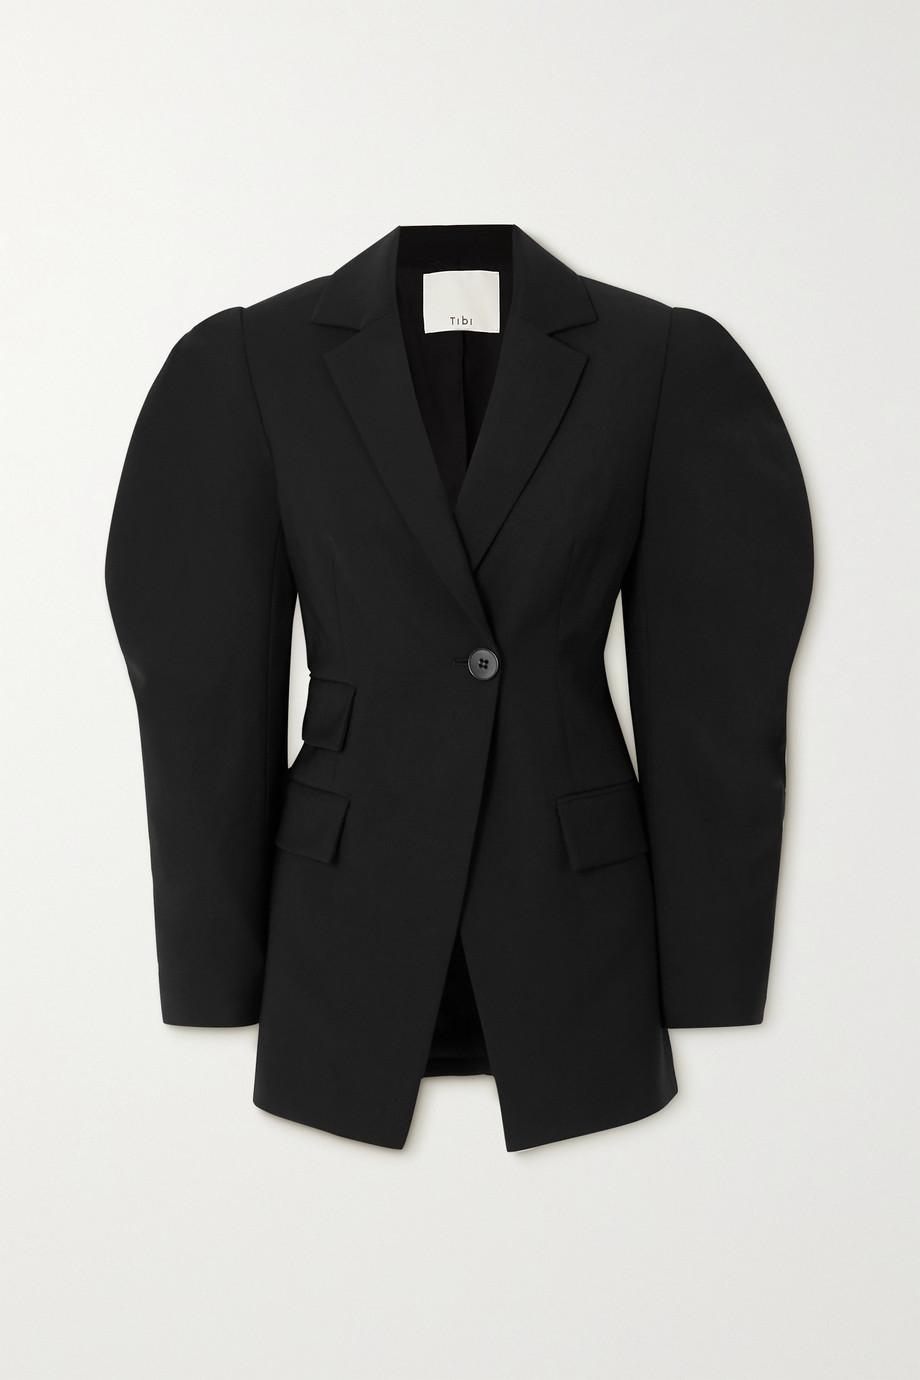 Tibi Wool-crepe blazer